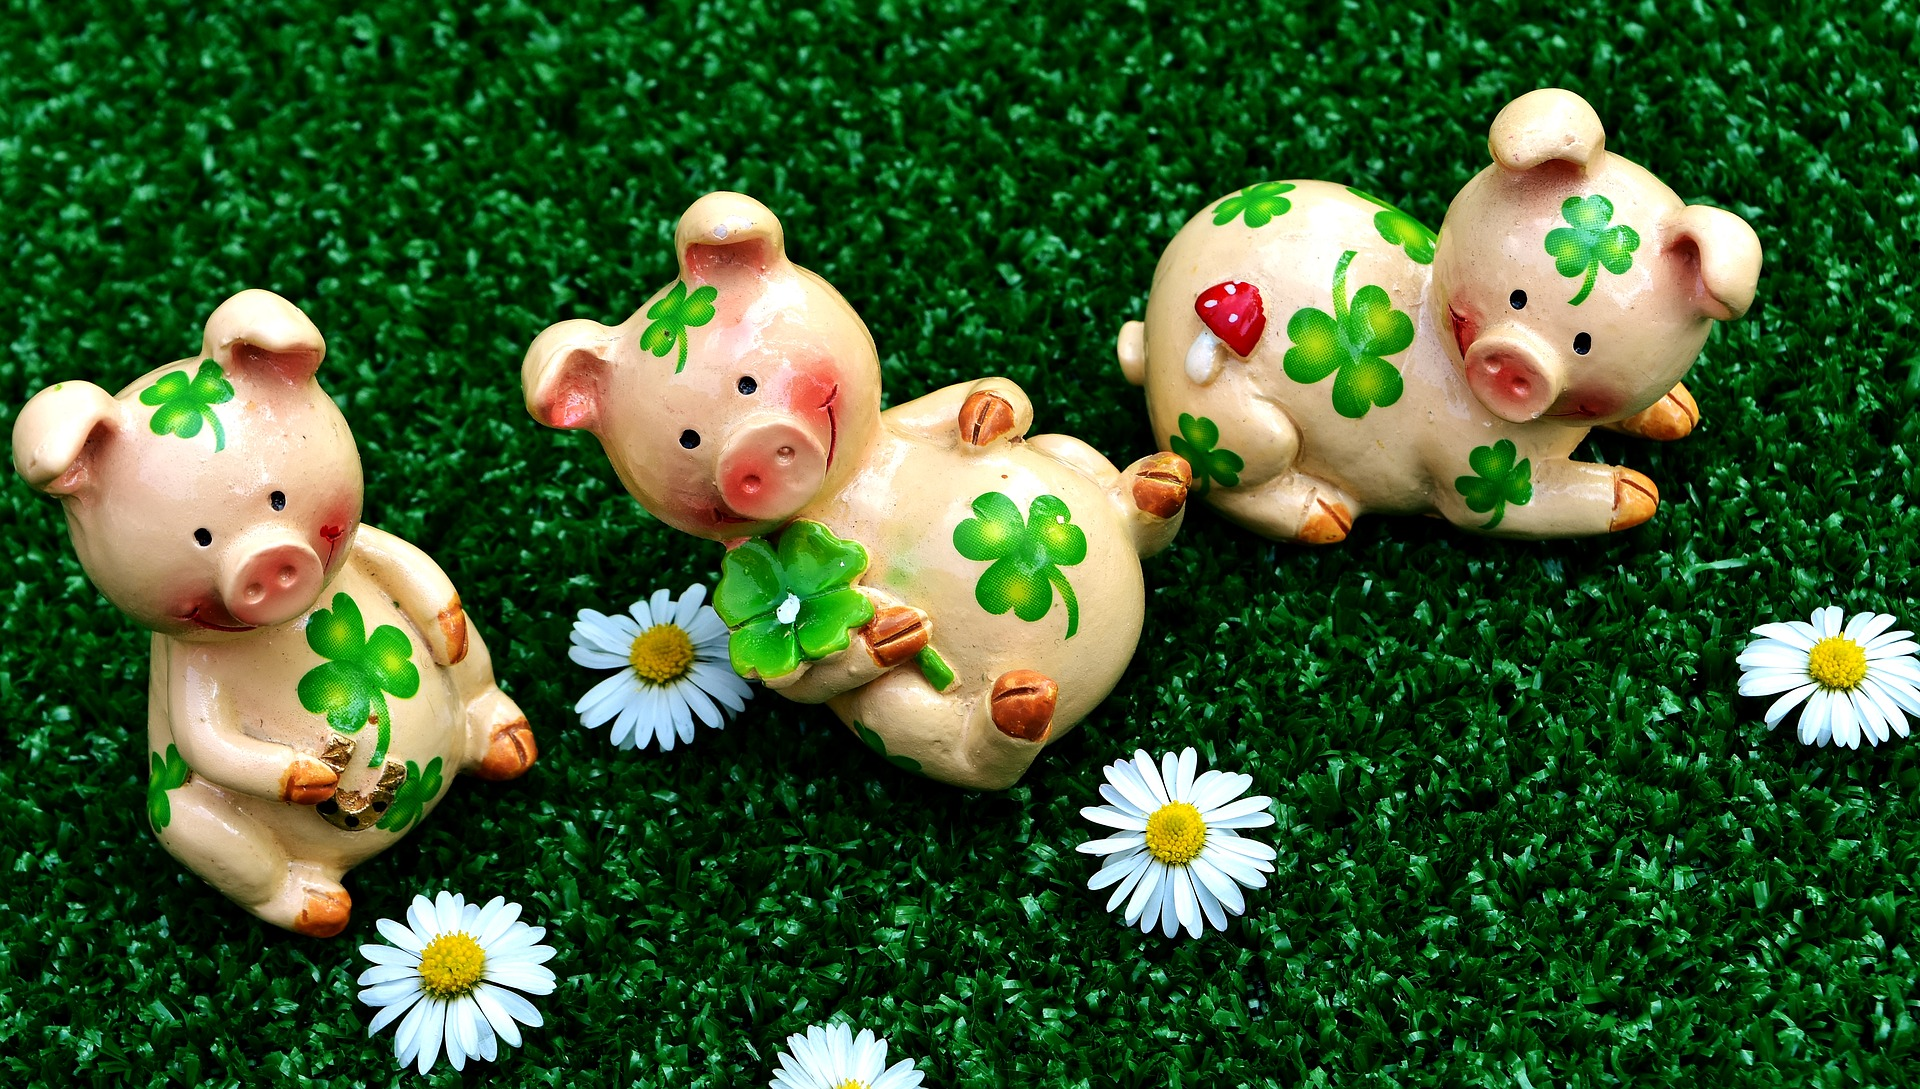 zodie noroc ghinion - sfatulparintilor.ro - pixabay_com - lucky-pig-2402894_1920